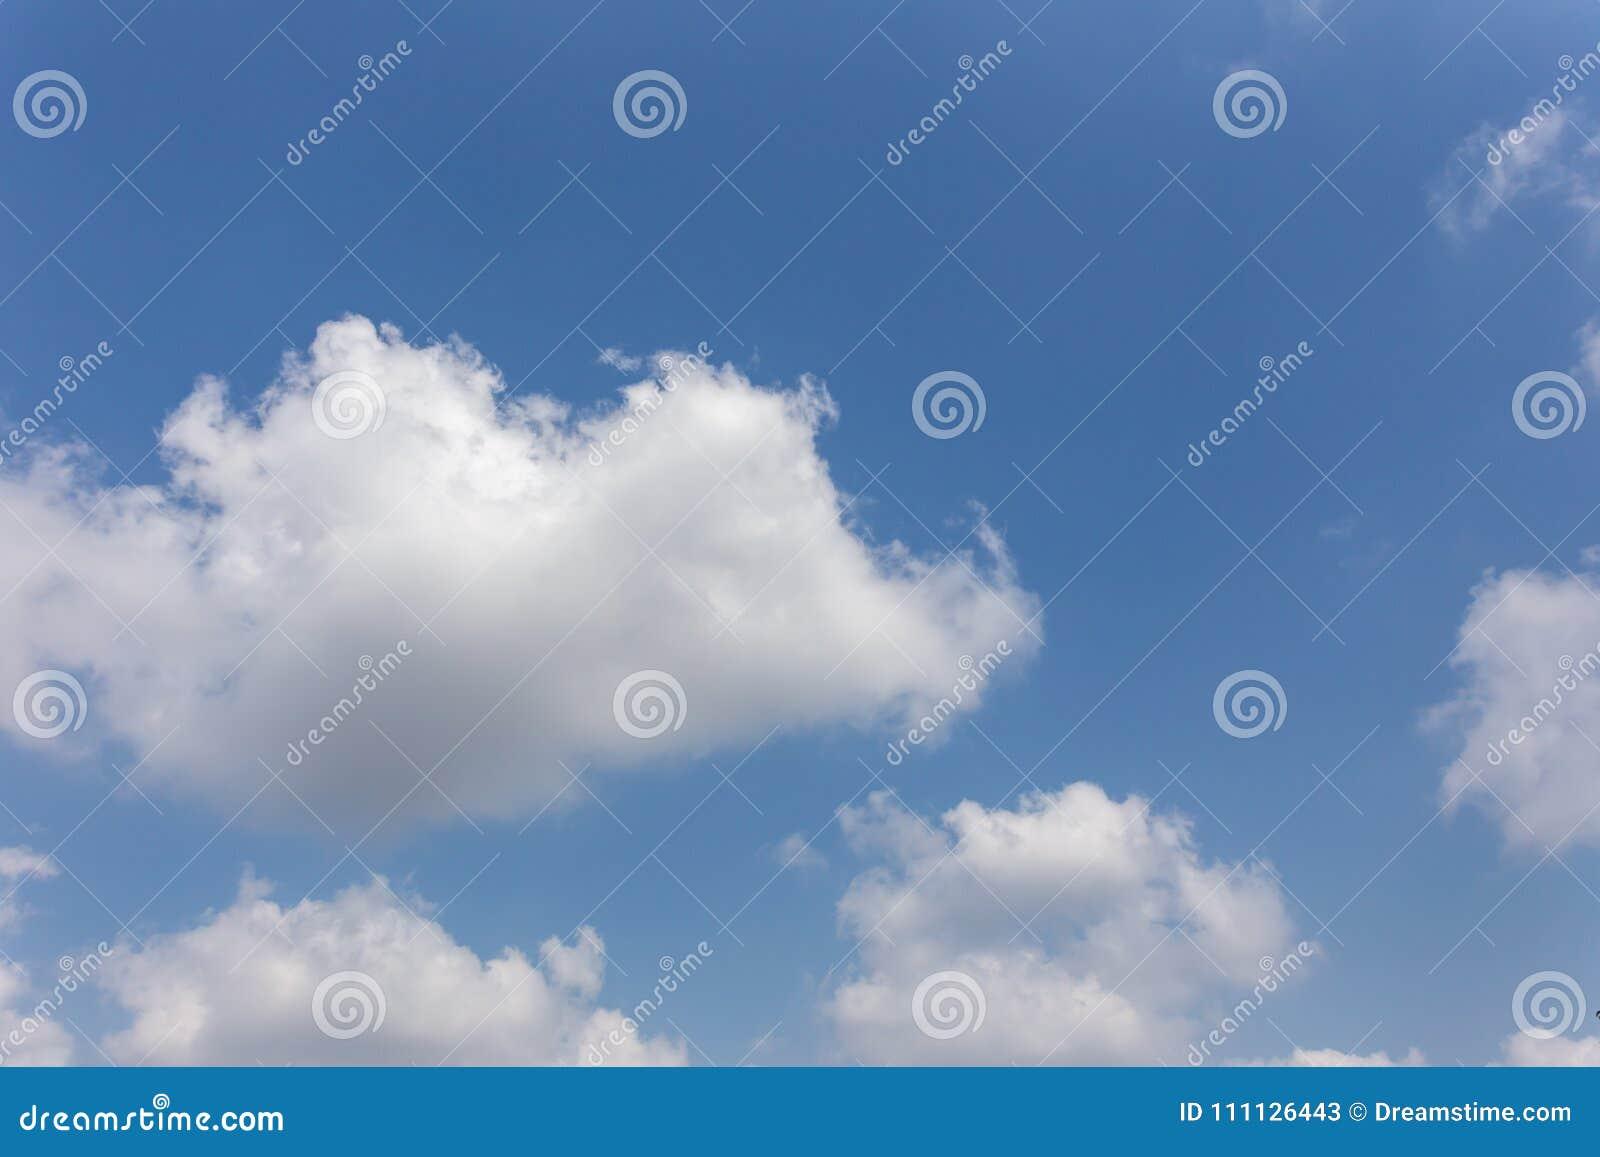 Fond de ciel bleu avec des nuages, ciel de fond